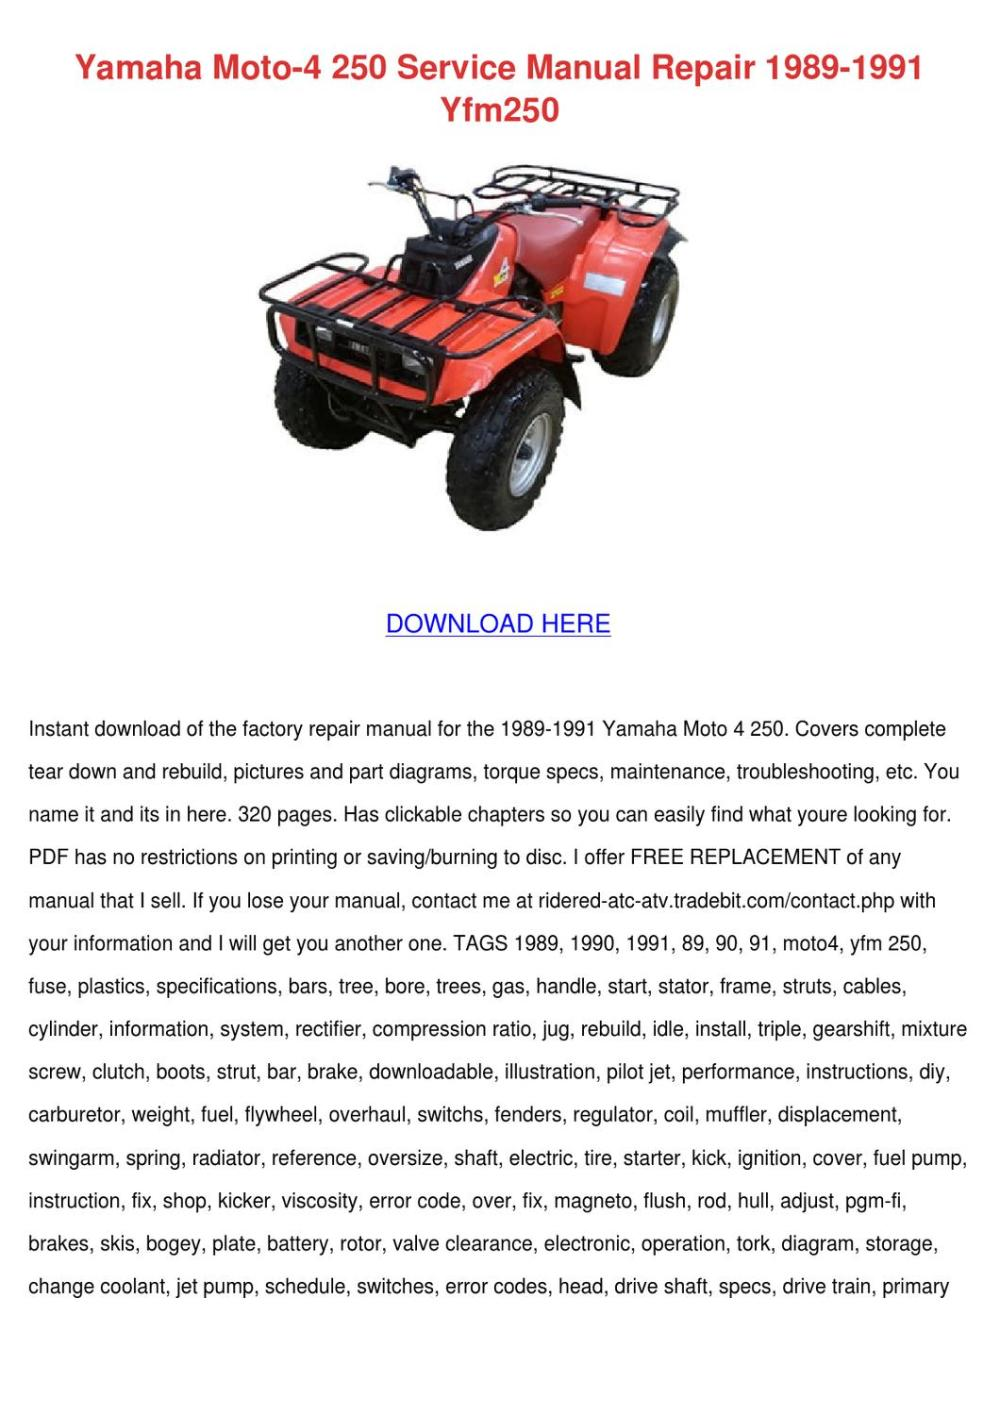 medium resolution of yamaha moto 4 250 service manual repair 1989